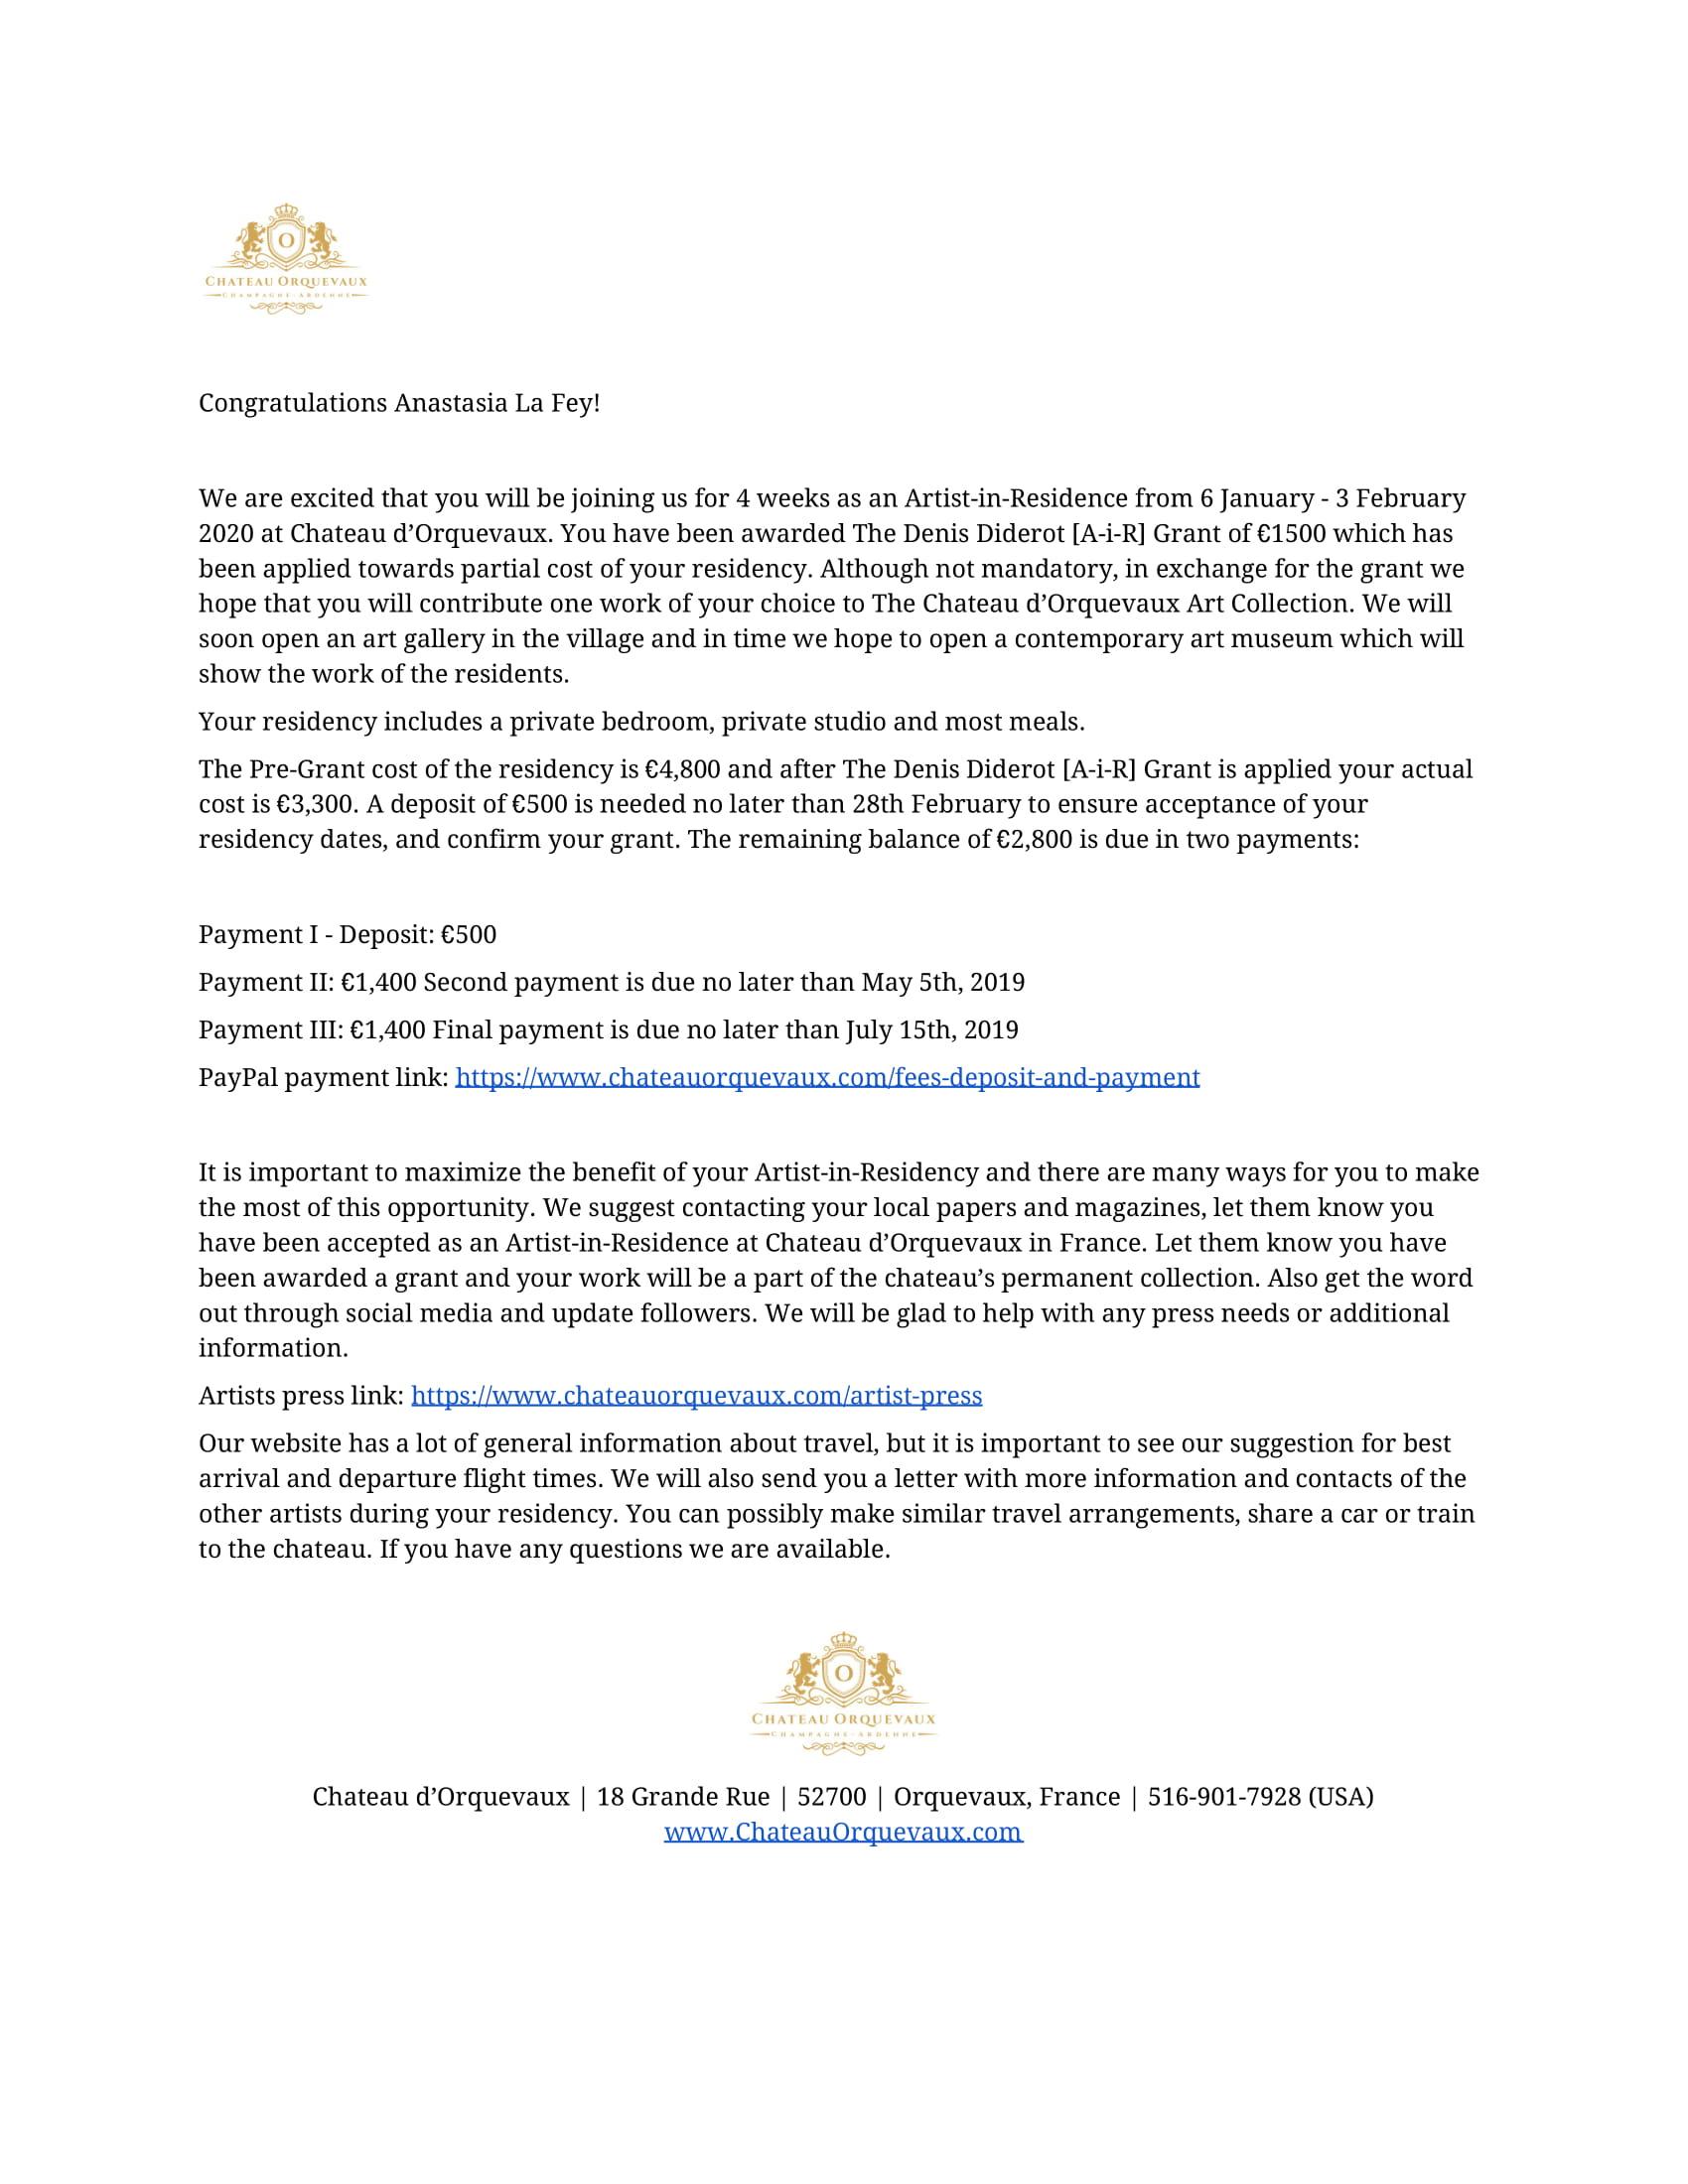 Payment Letter Anastasia La Fey-1.jpg